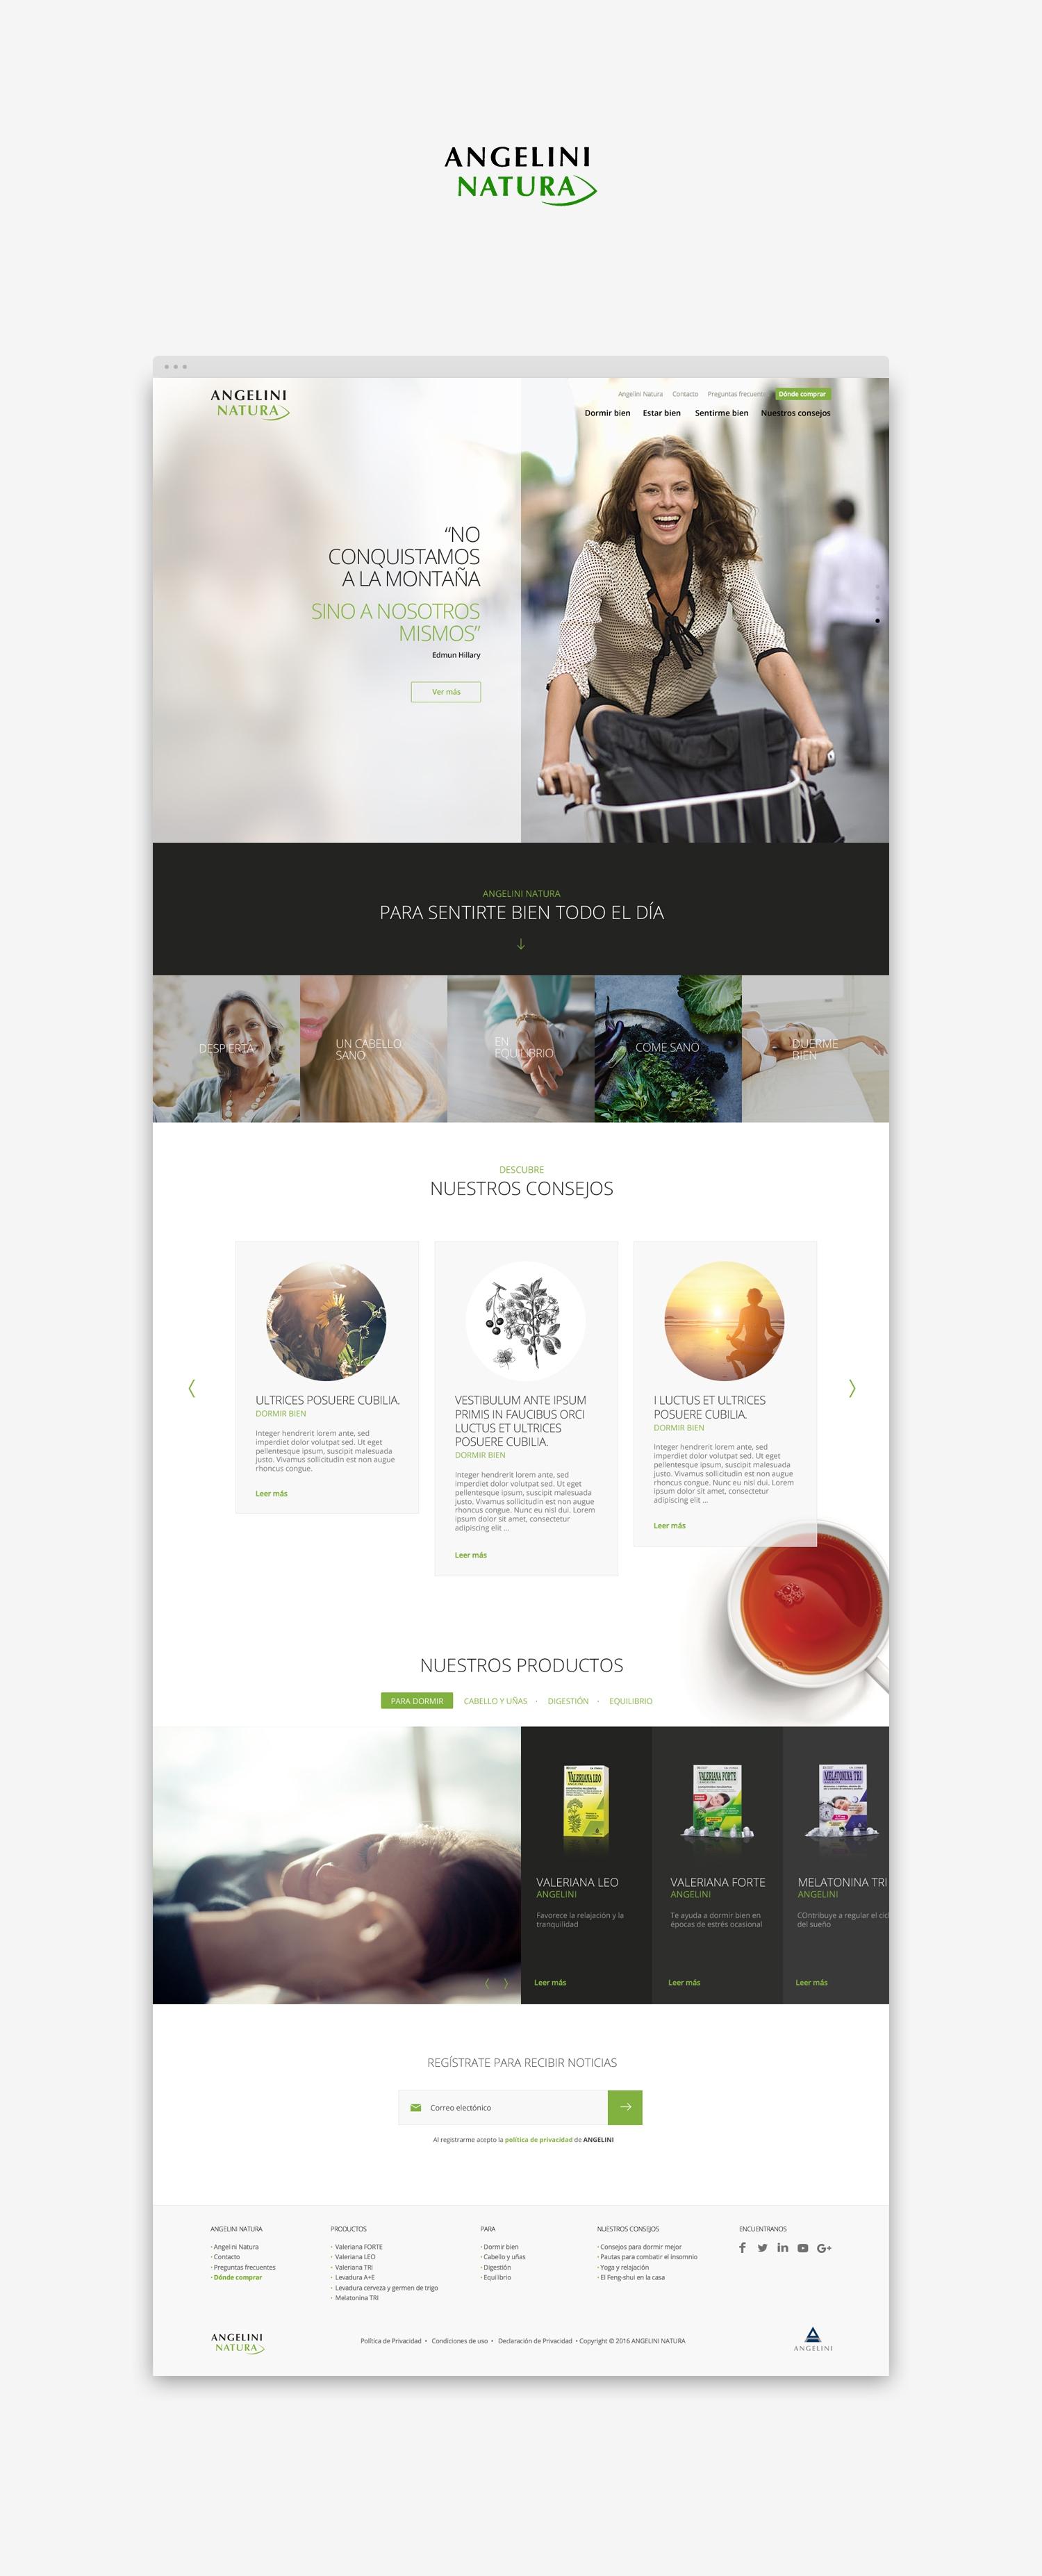 Diseño web · Angelini Natura · Samuel Matito · diseñador freelance